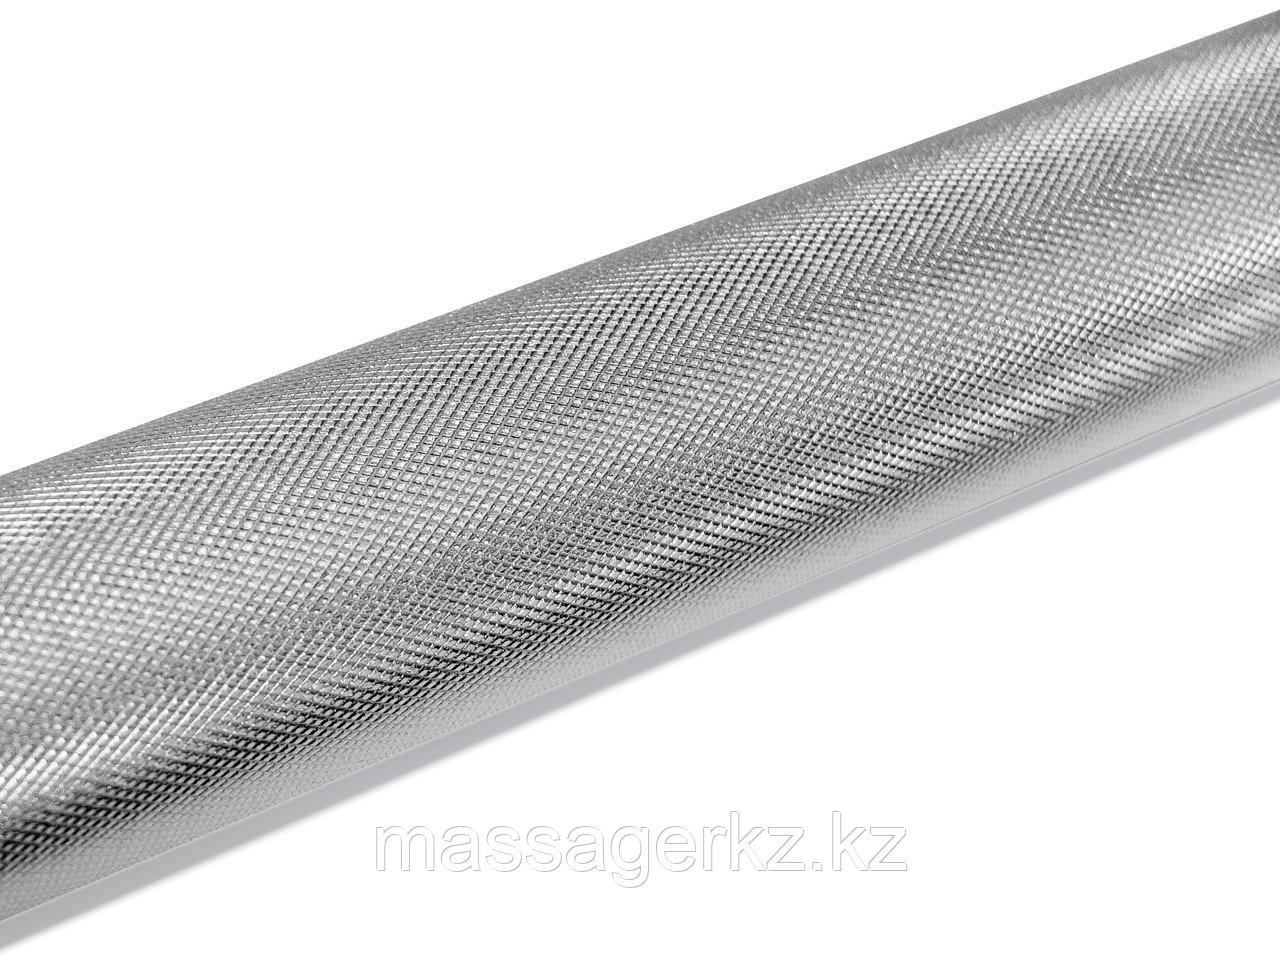 Рукоятка для тяги за голову алюминиевая два крепления 121 см - фото 4